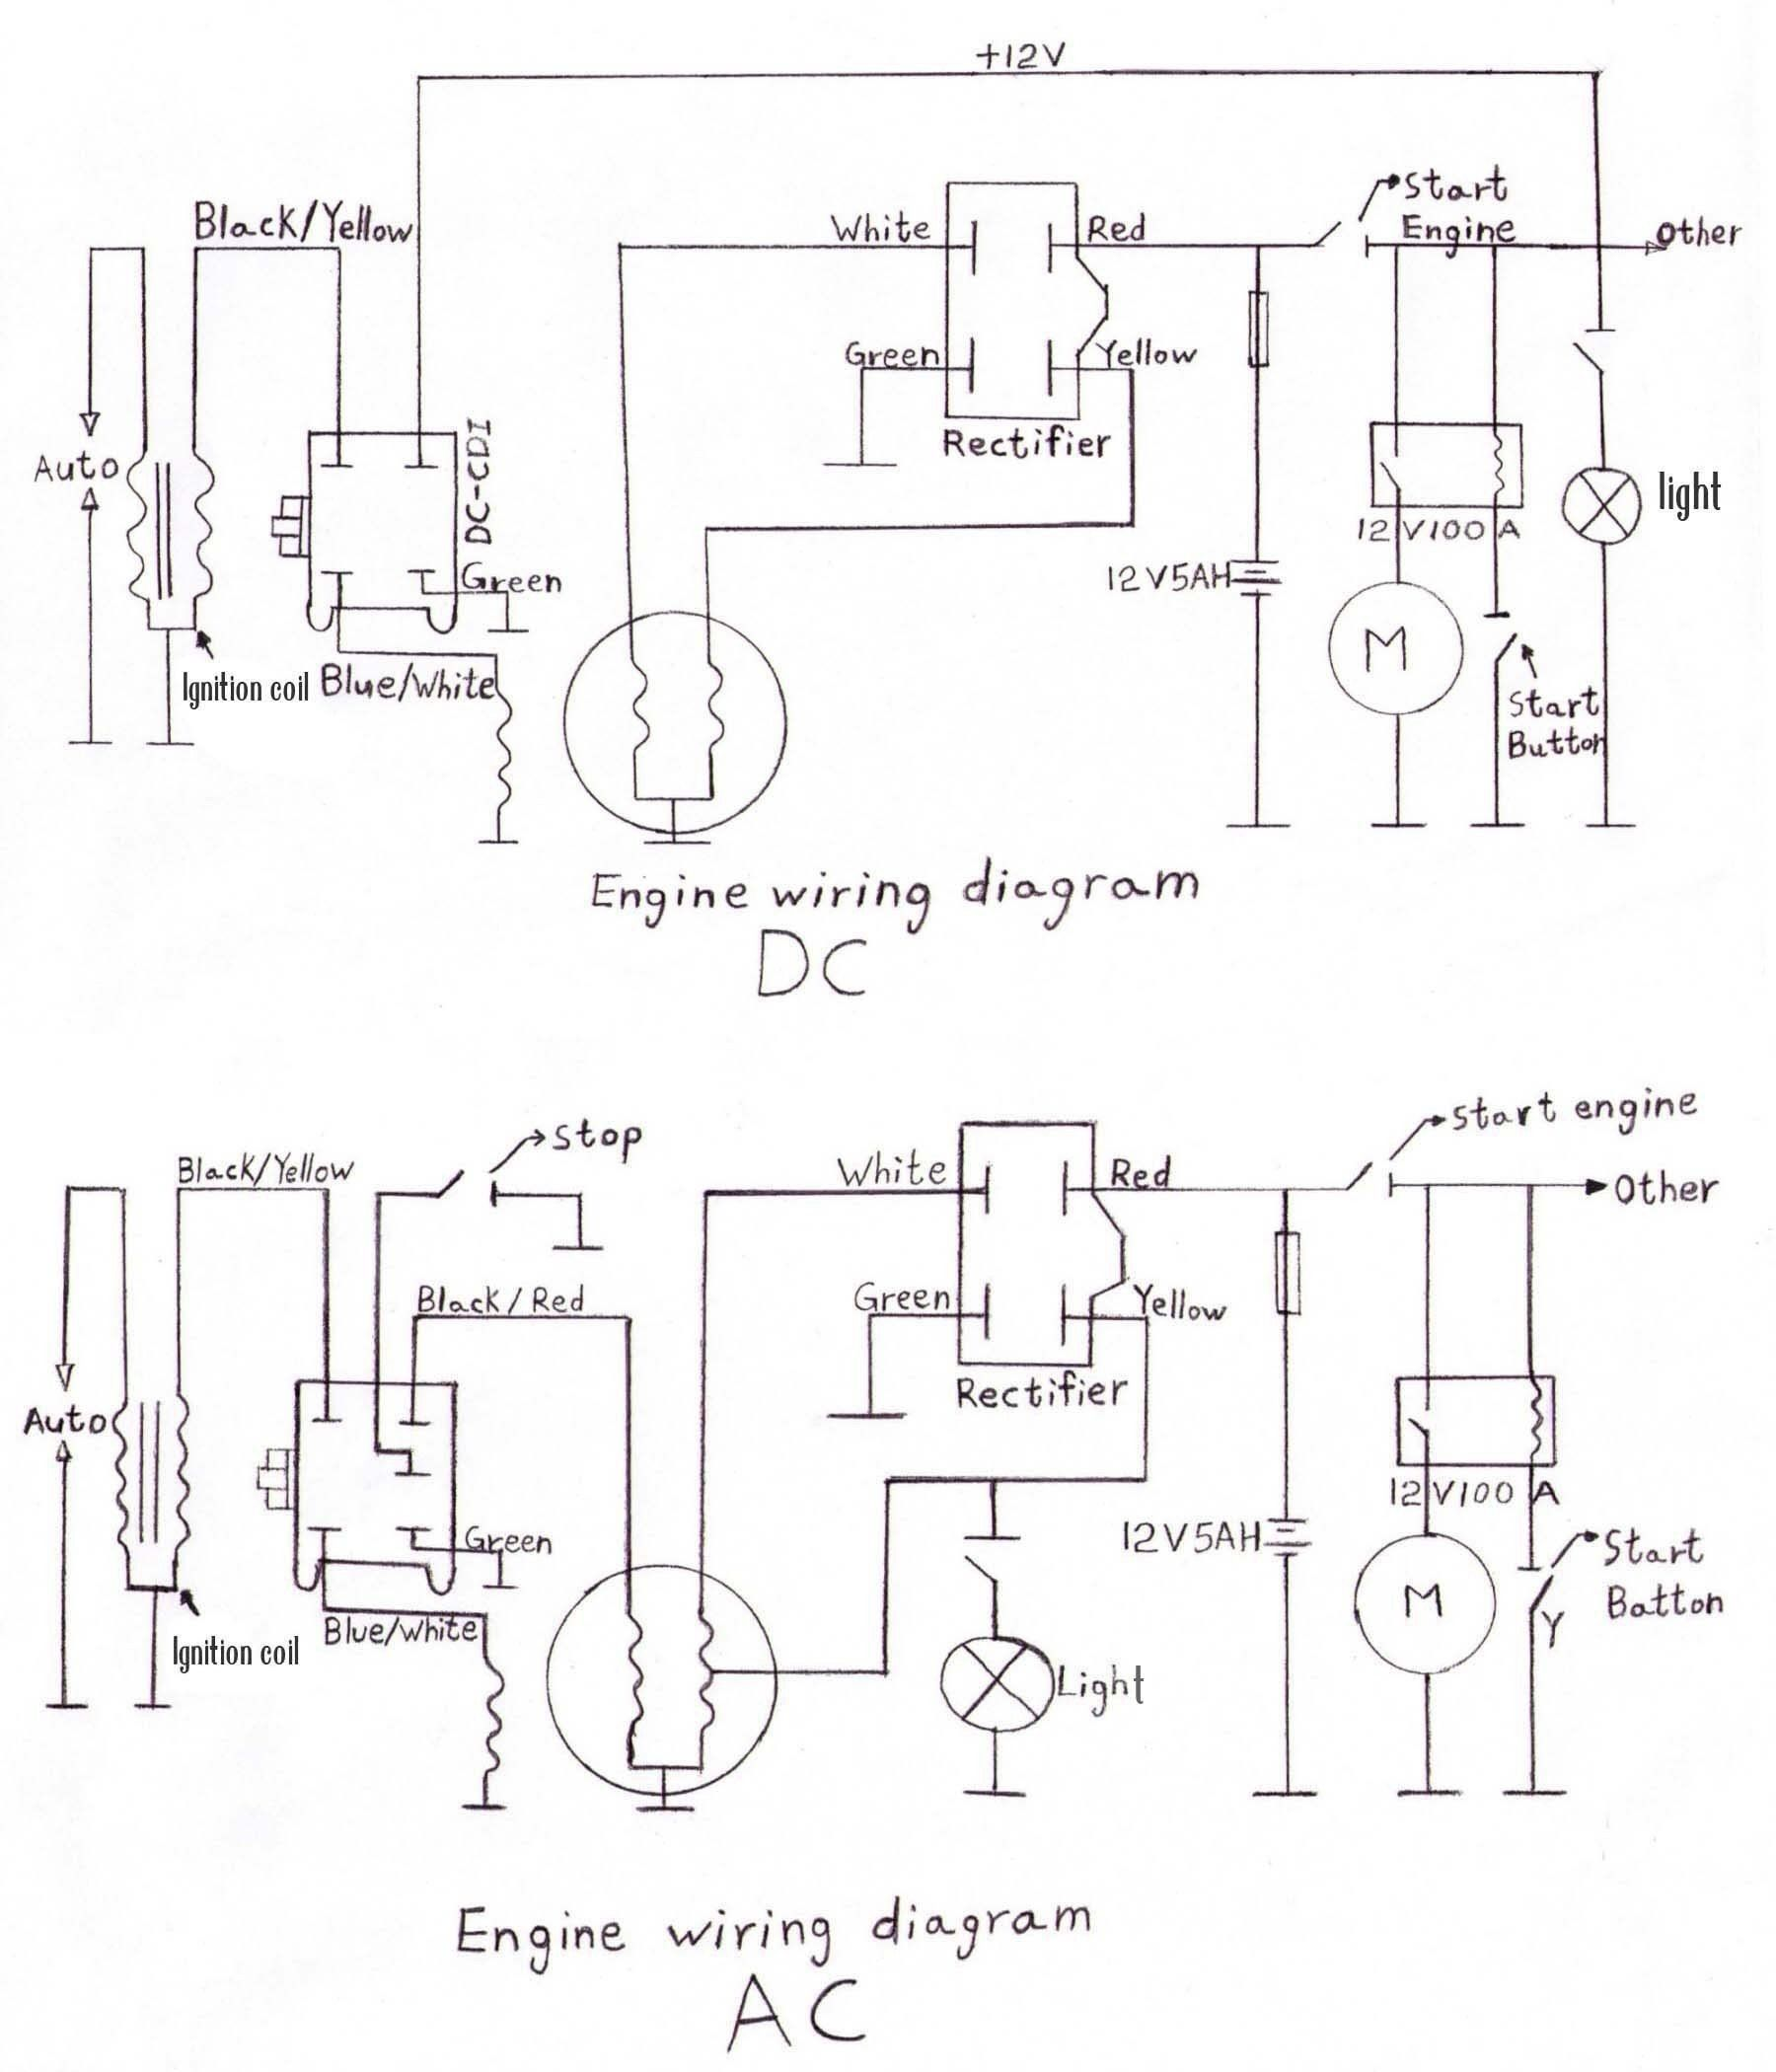 hight resolution of lifan generator wiring diagram inspirationa lifan 125cc wiring throughout lifan 125 wiring diagram